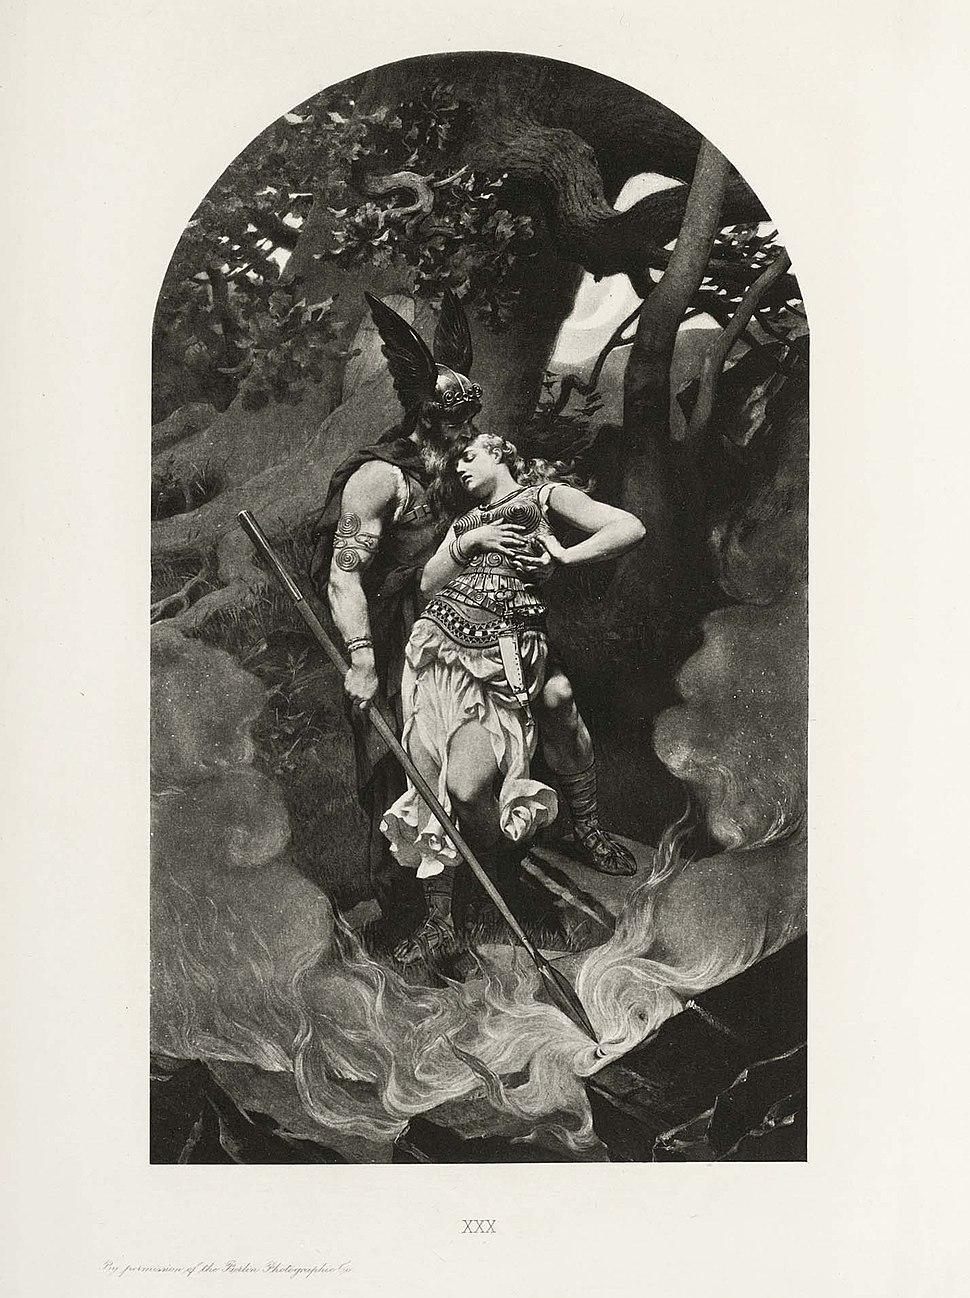 Wotan takes leave of Brunhild (1892) by Konrad Dielitz